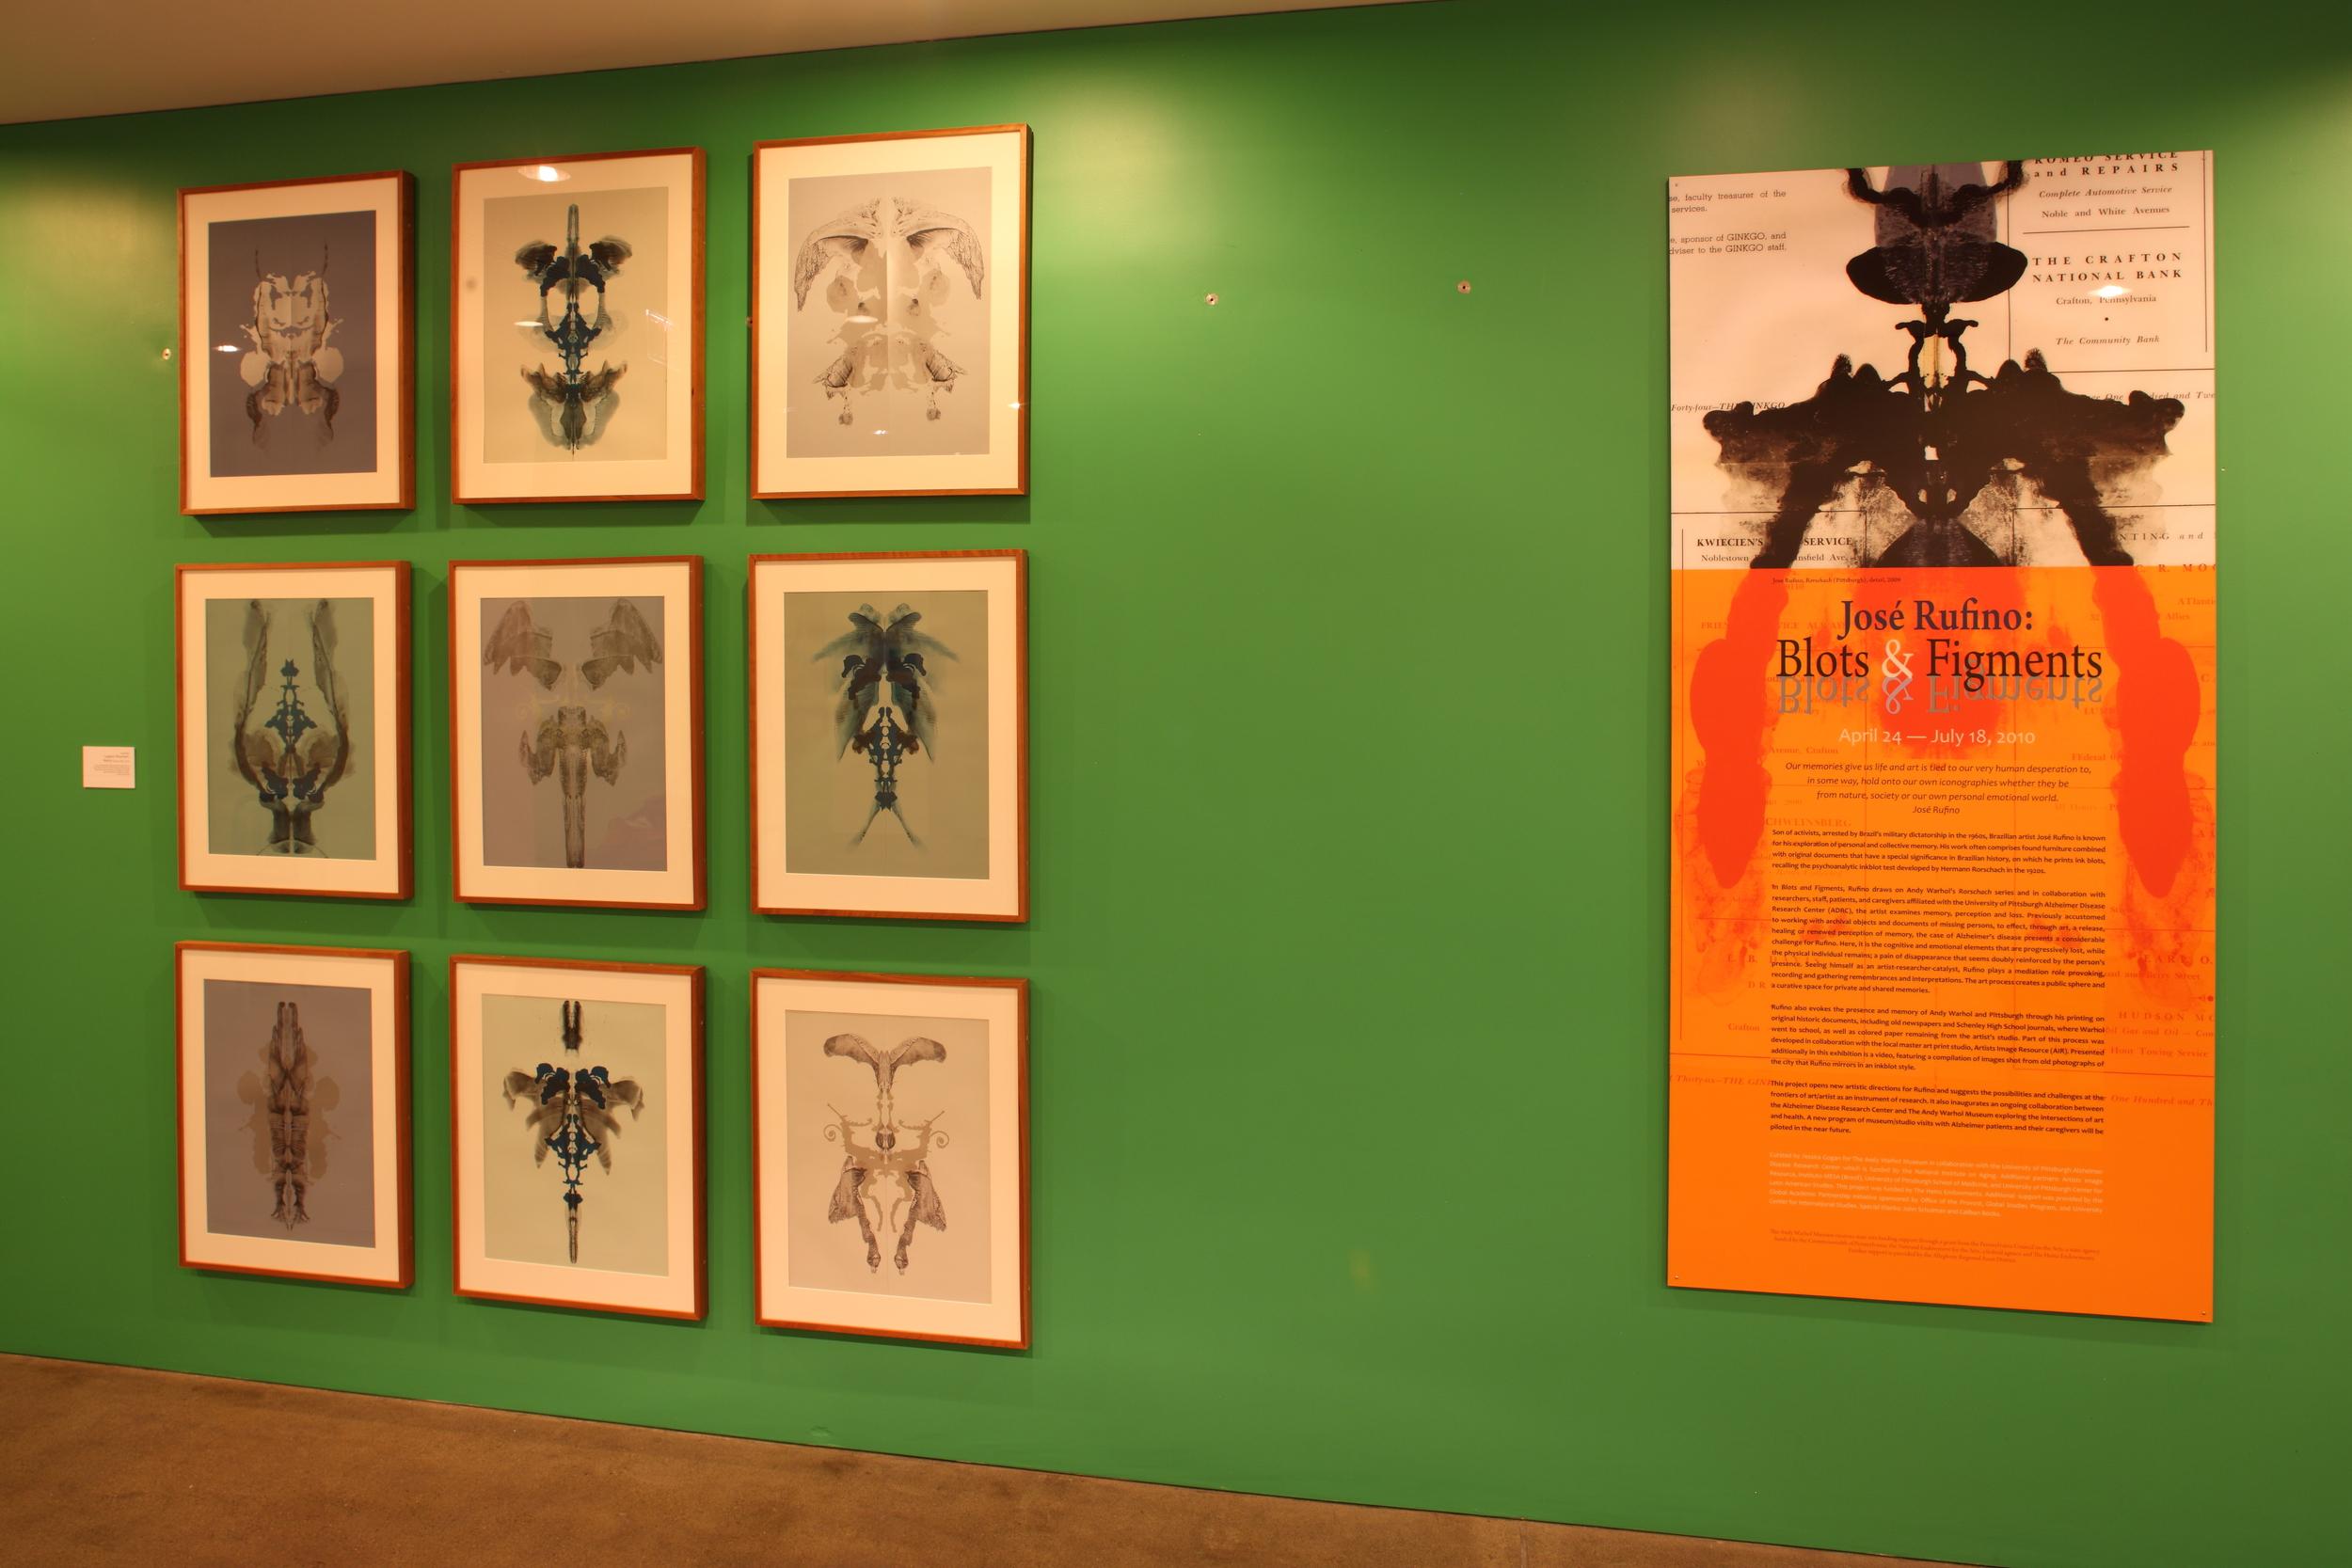 Jose Rufino - Blots & Figments at The Andy Warhol Museum, 2010 001.JPG